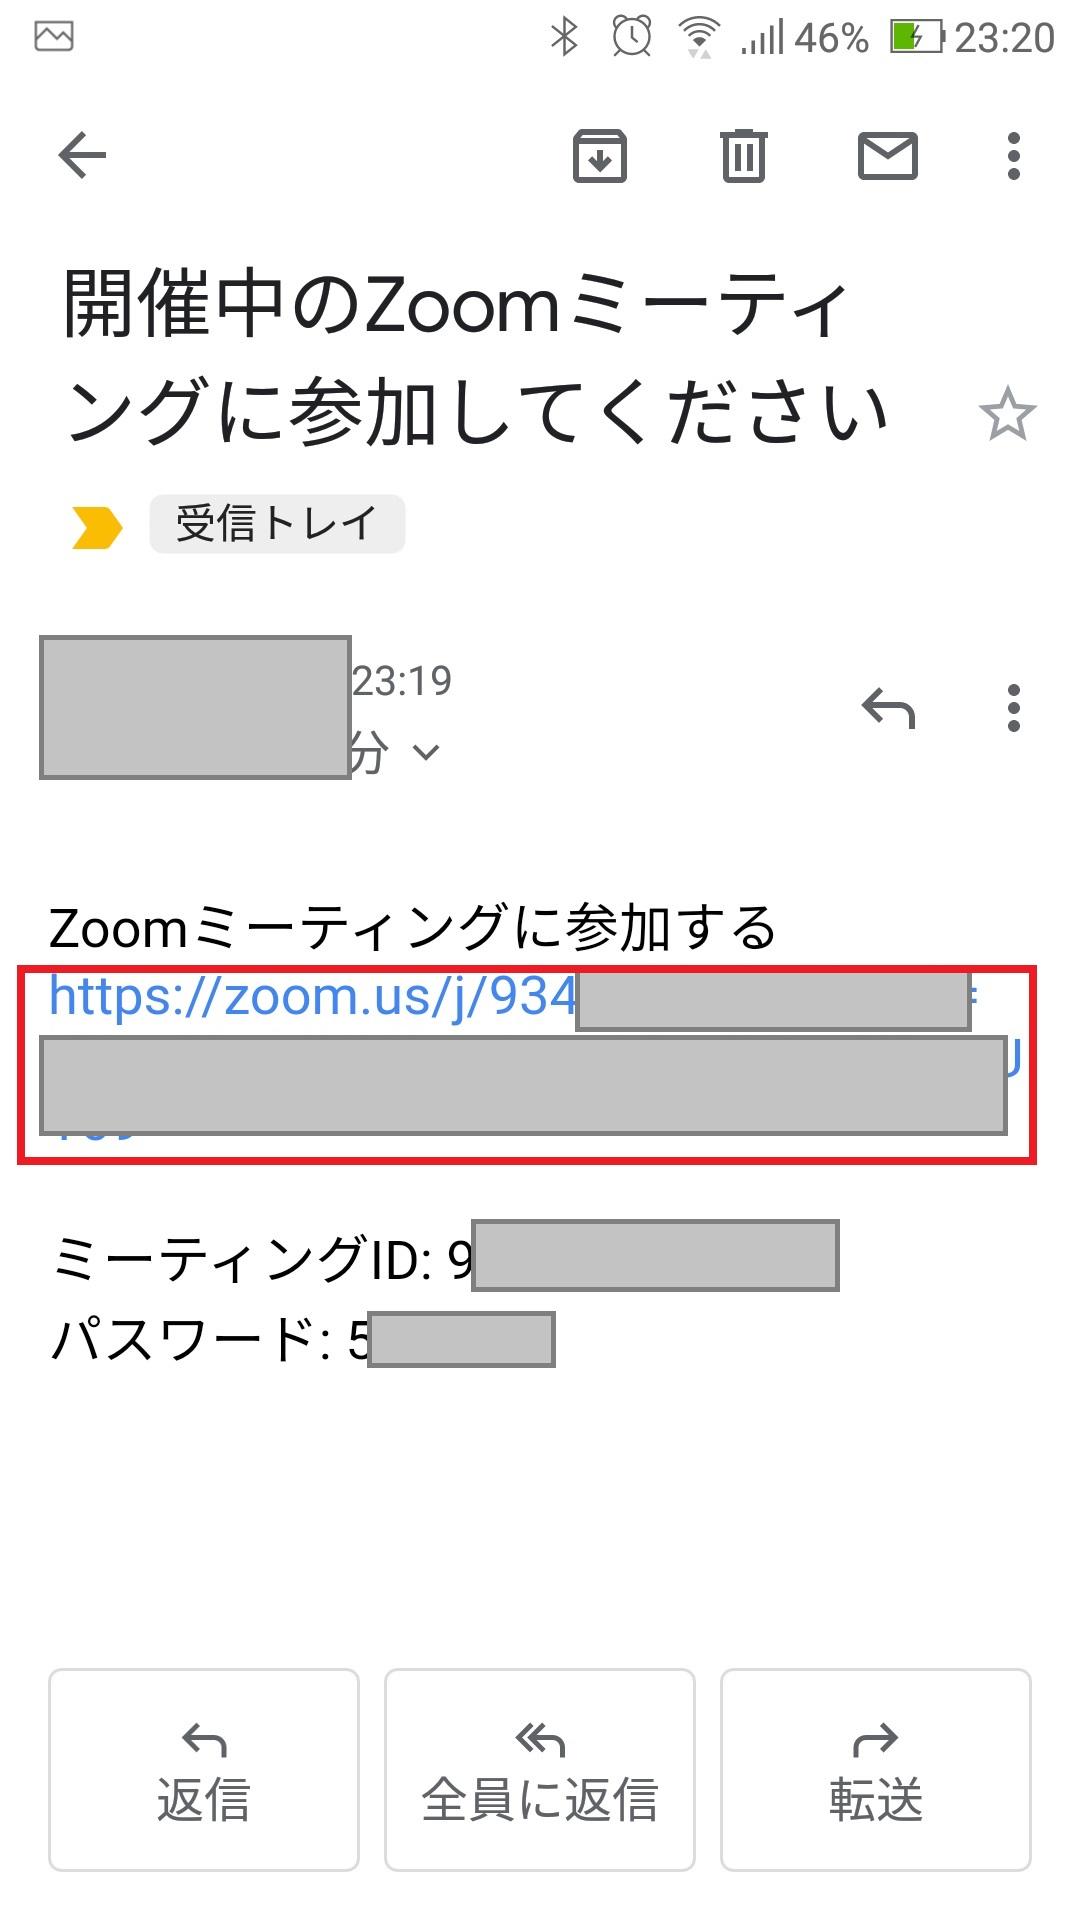 Screenshot 20200416 232005 - Zoomの使い方~一人で総合セルフチェック(パソコンとスマホを使って自分で)